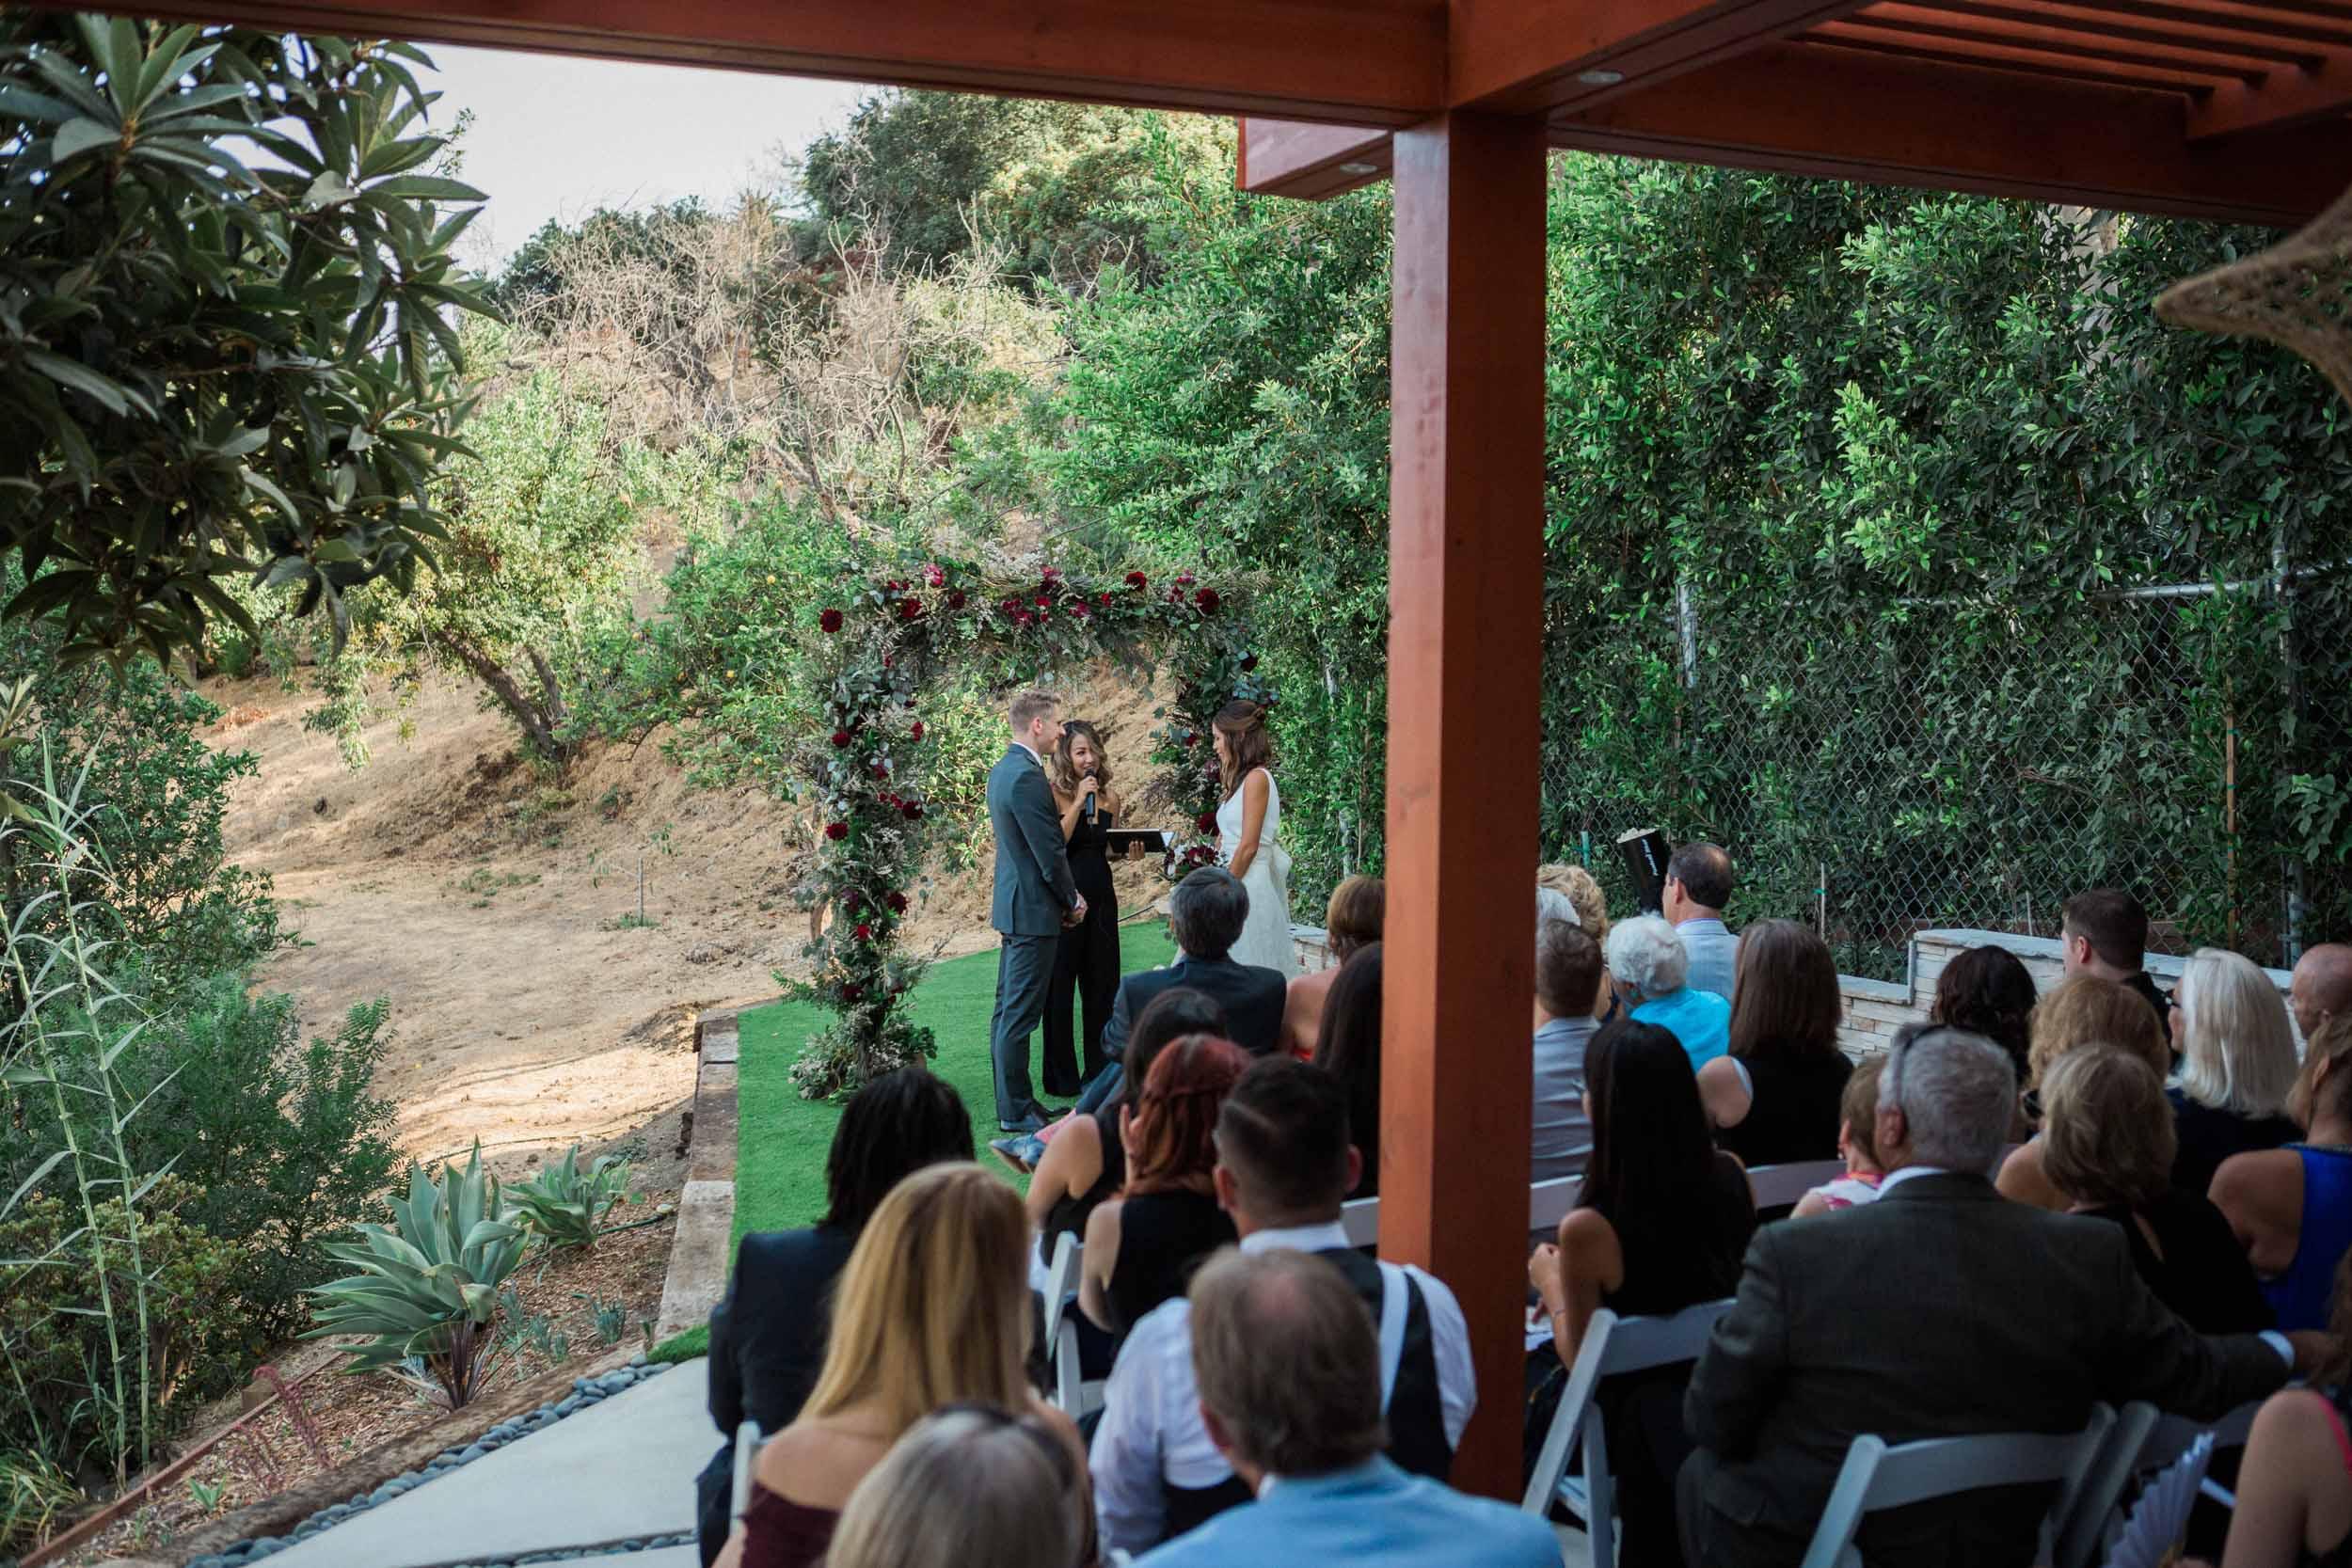 BKM-Photography-Highland-Park-Los-Angeles-Backyard-Wedding-0027.jpg